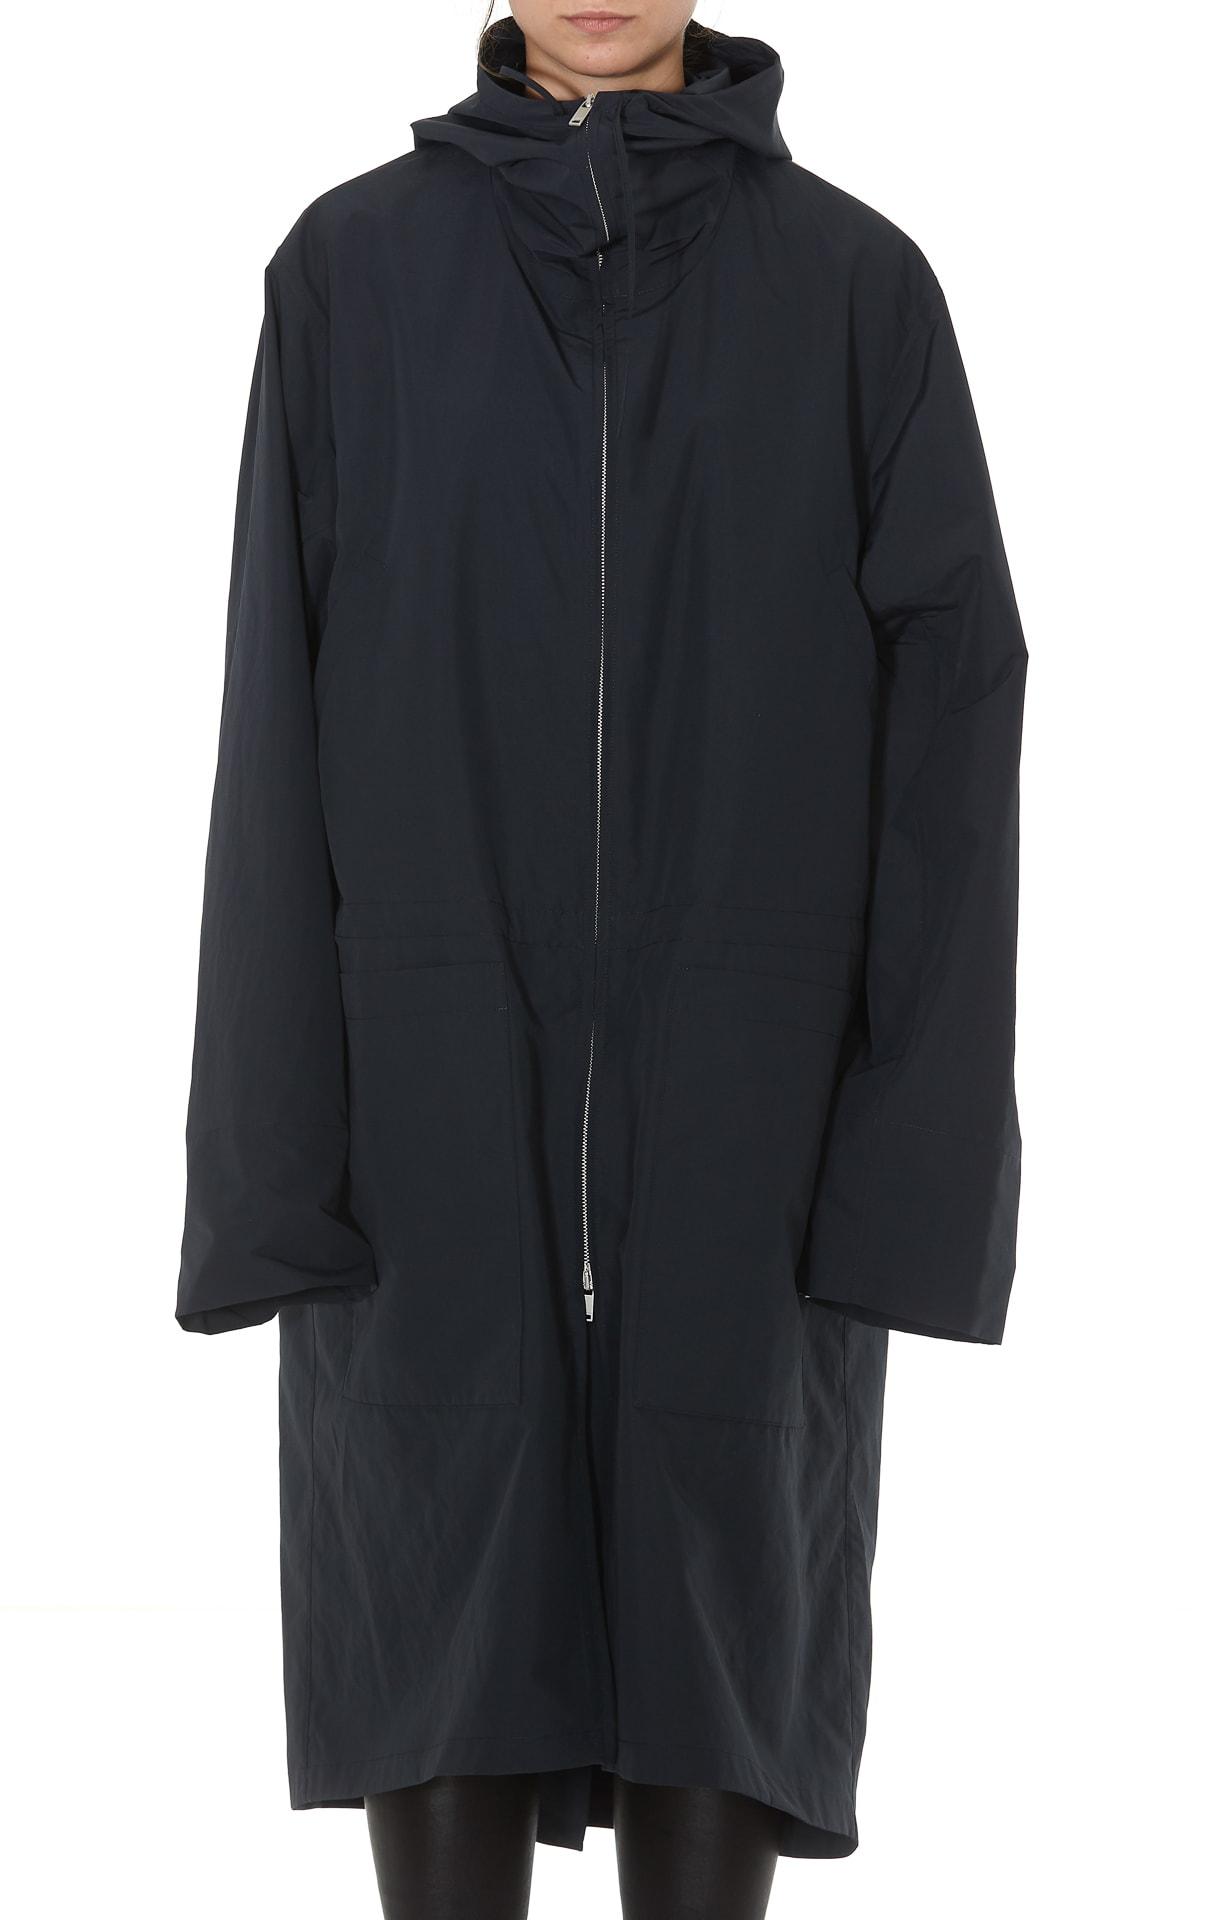 Jil Sander Parka Coat